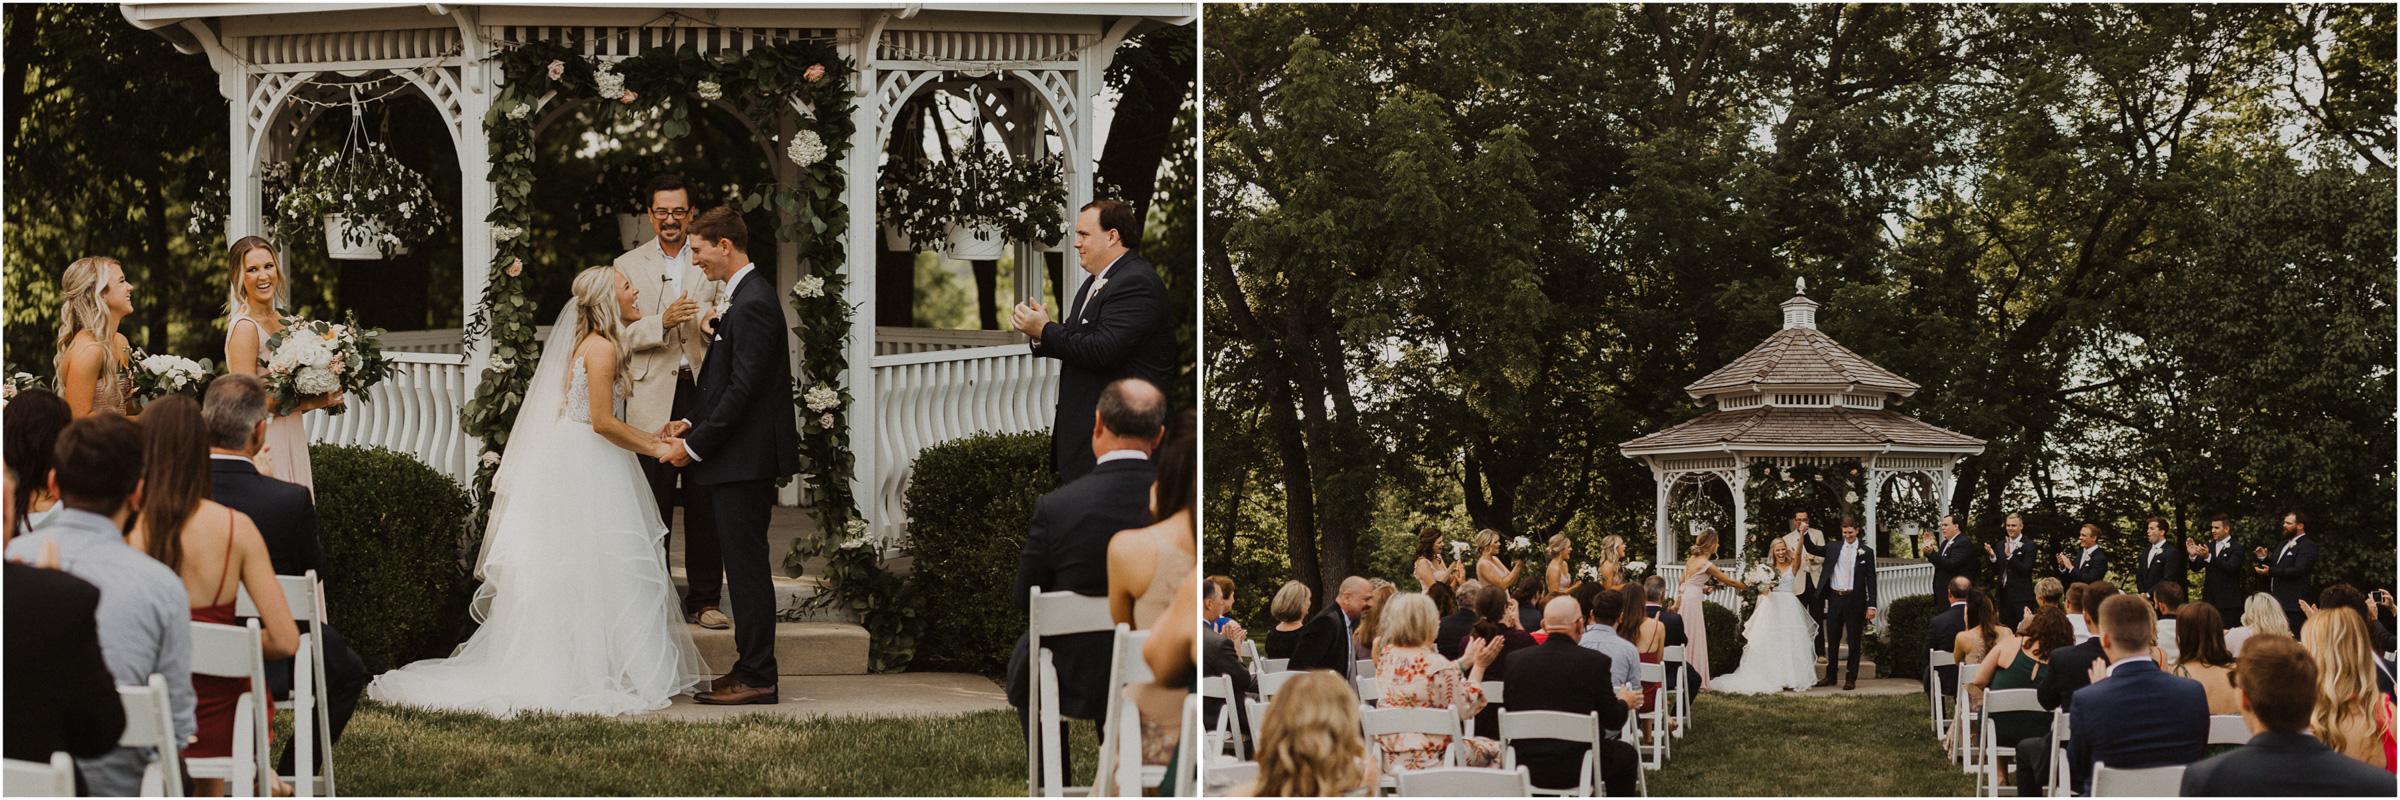 alyssa barletter photography hawthorne house summer outdoor wedding southern charm inspiration-50.jpg